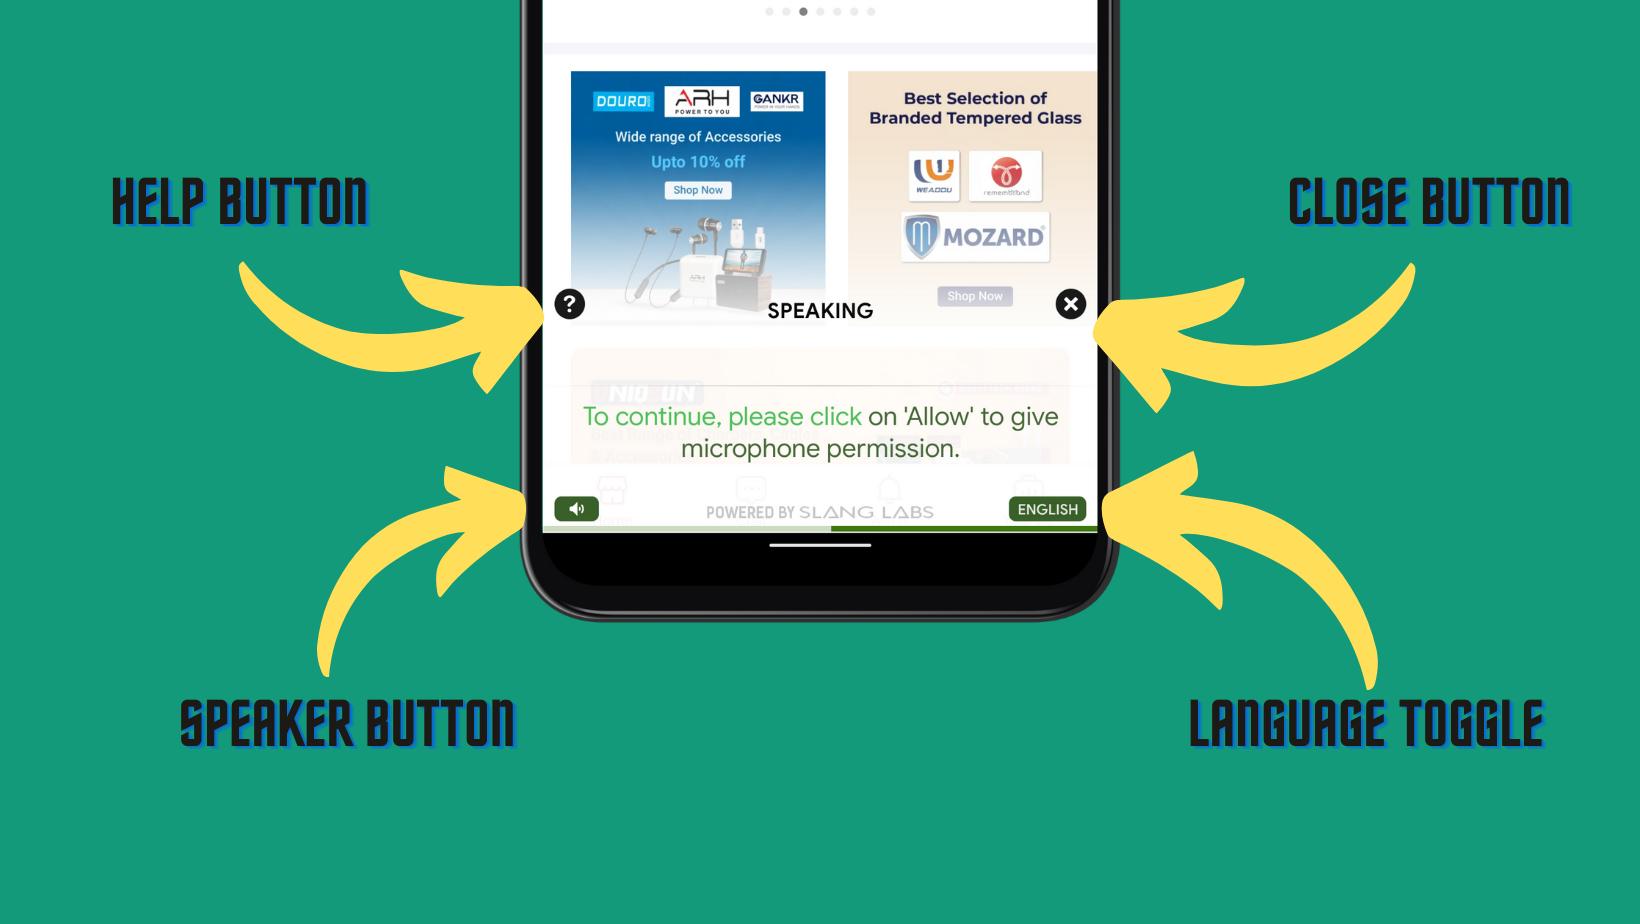 Slang Surface inside Udaan App